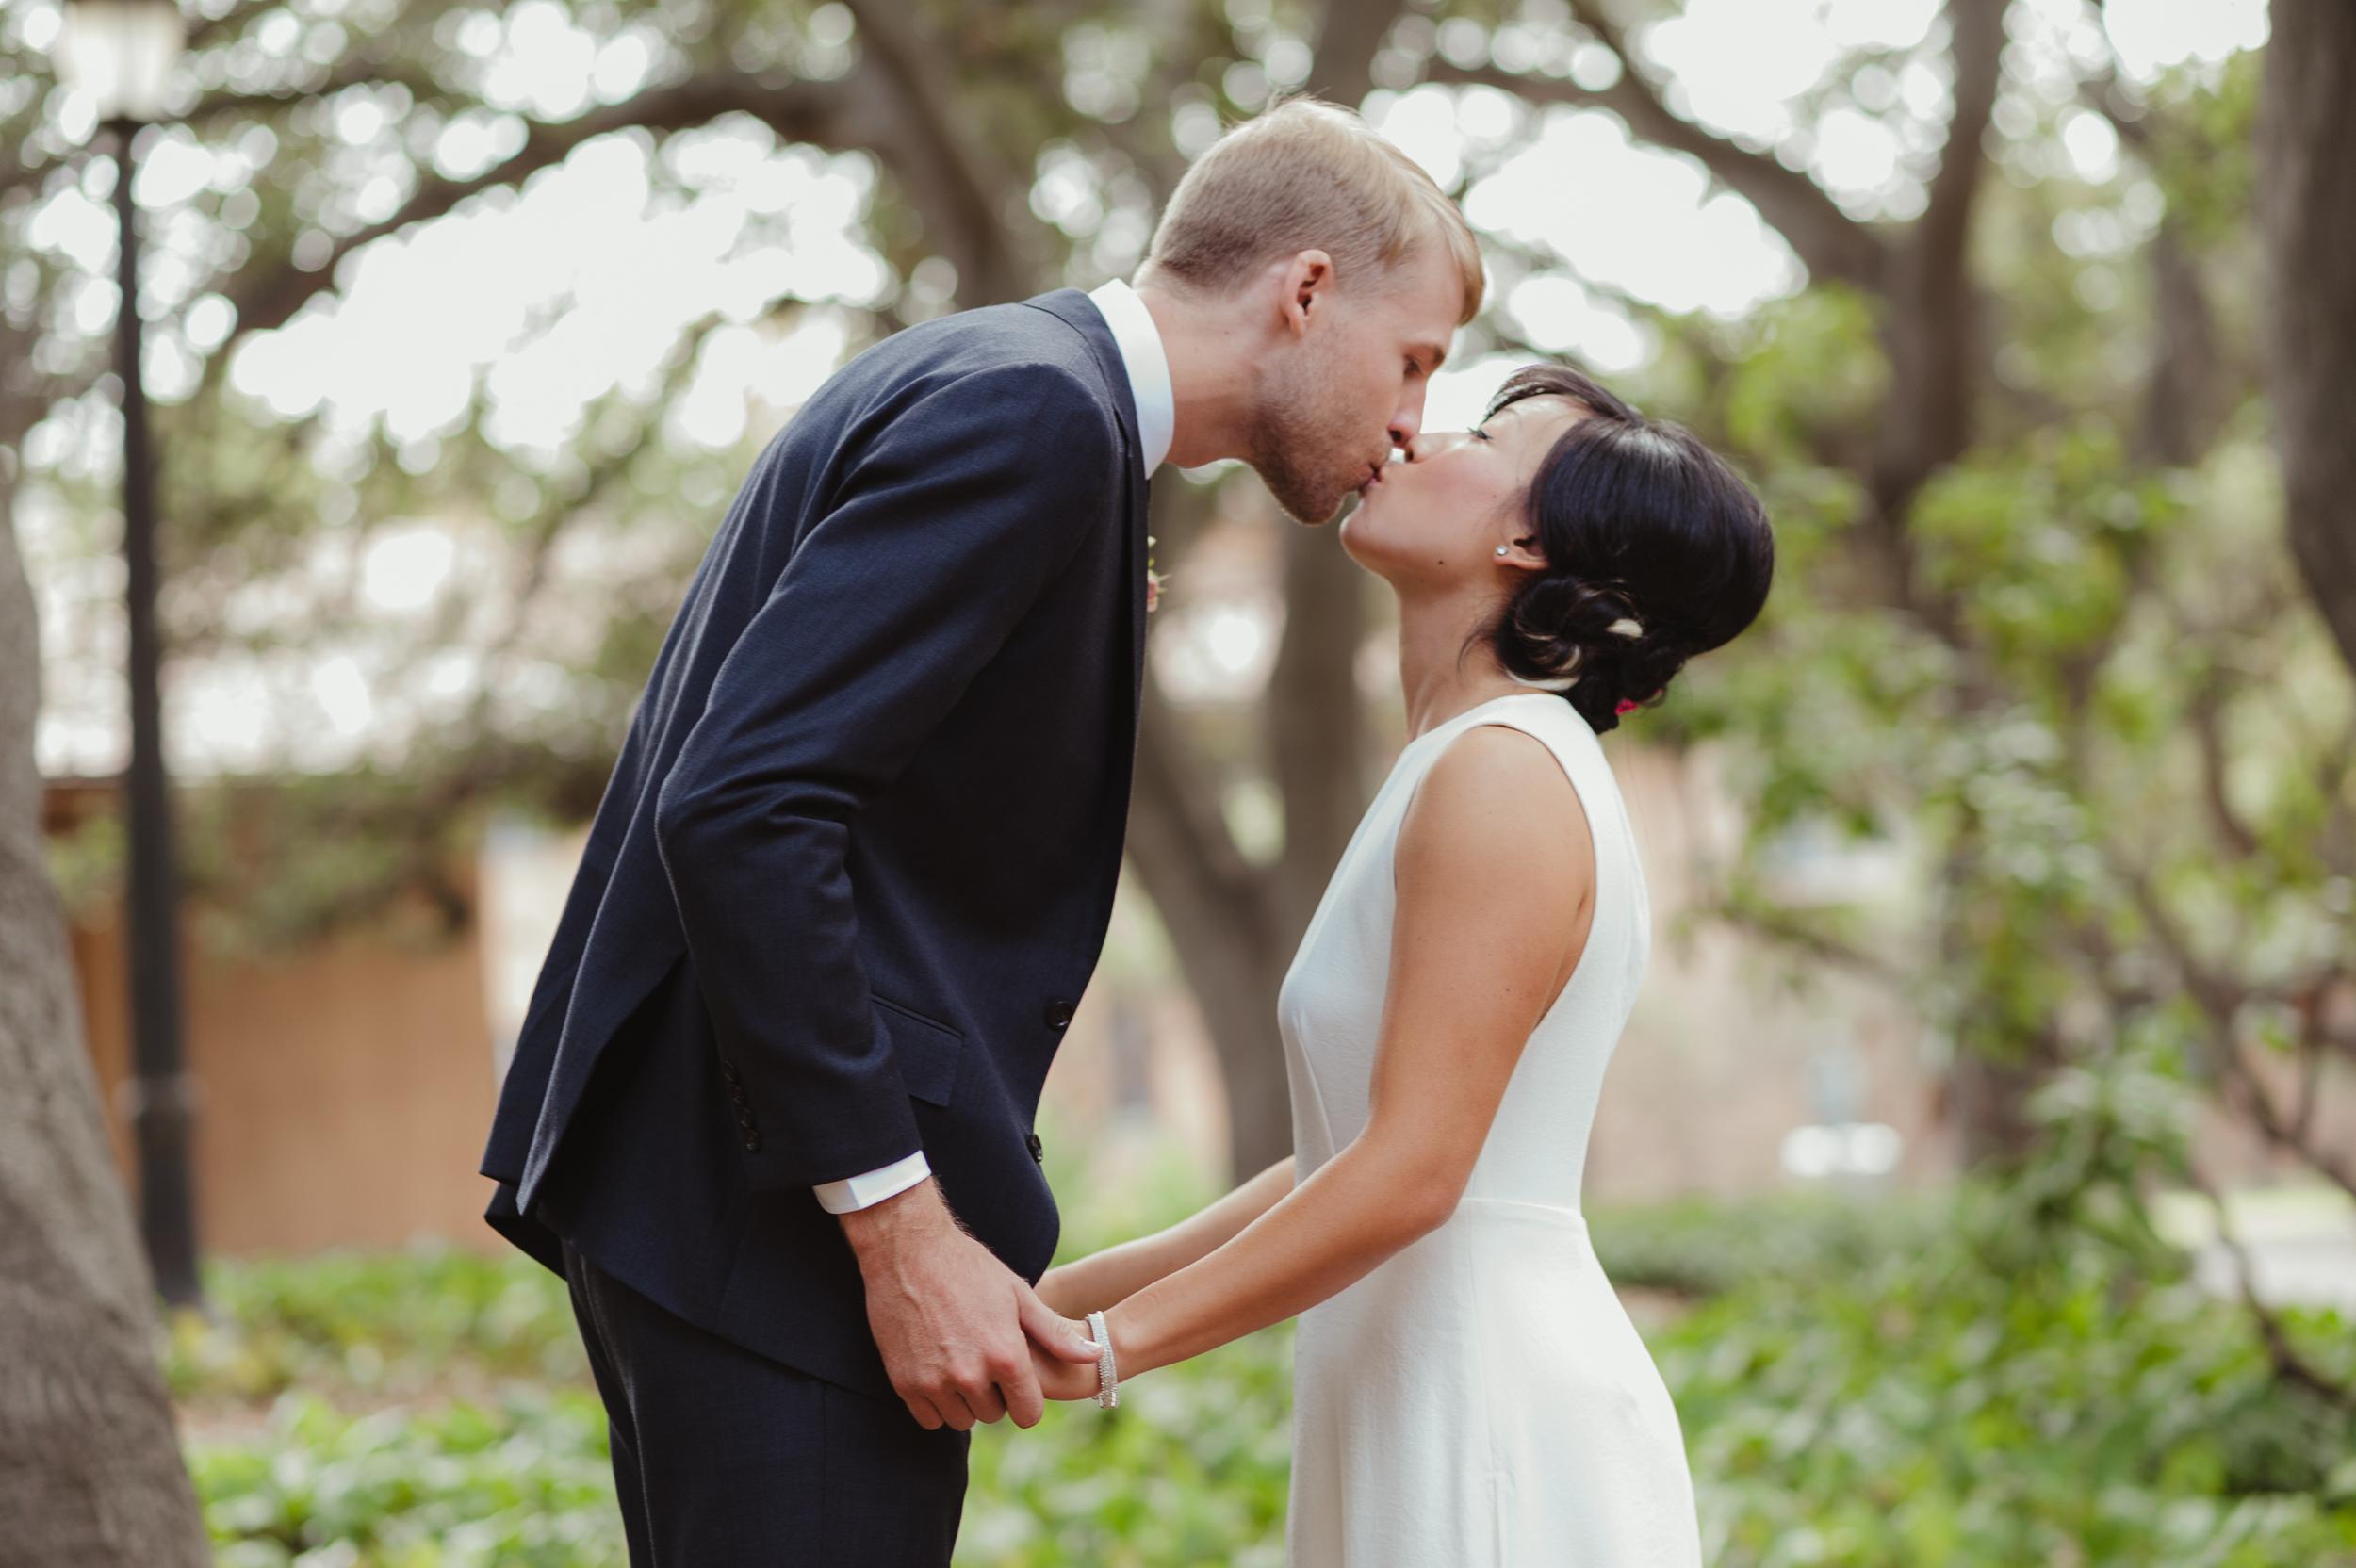 faculty-club-berkeley-wedding-photographer-vc019.jpg